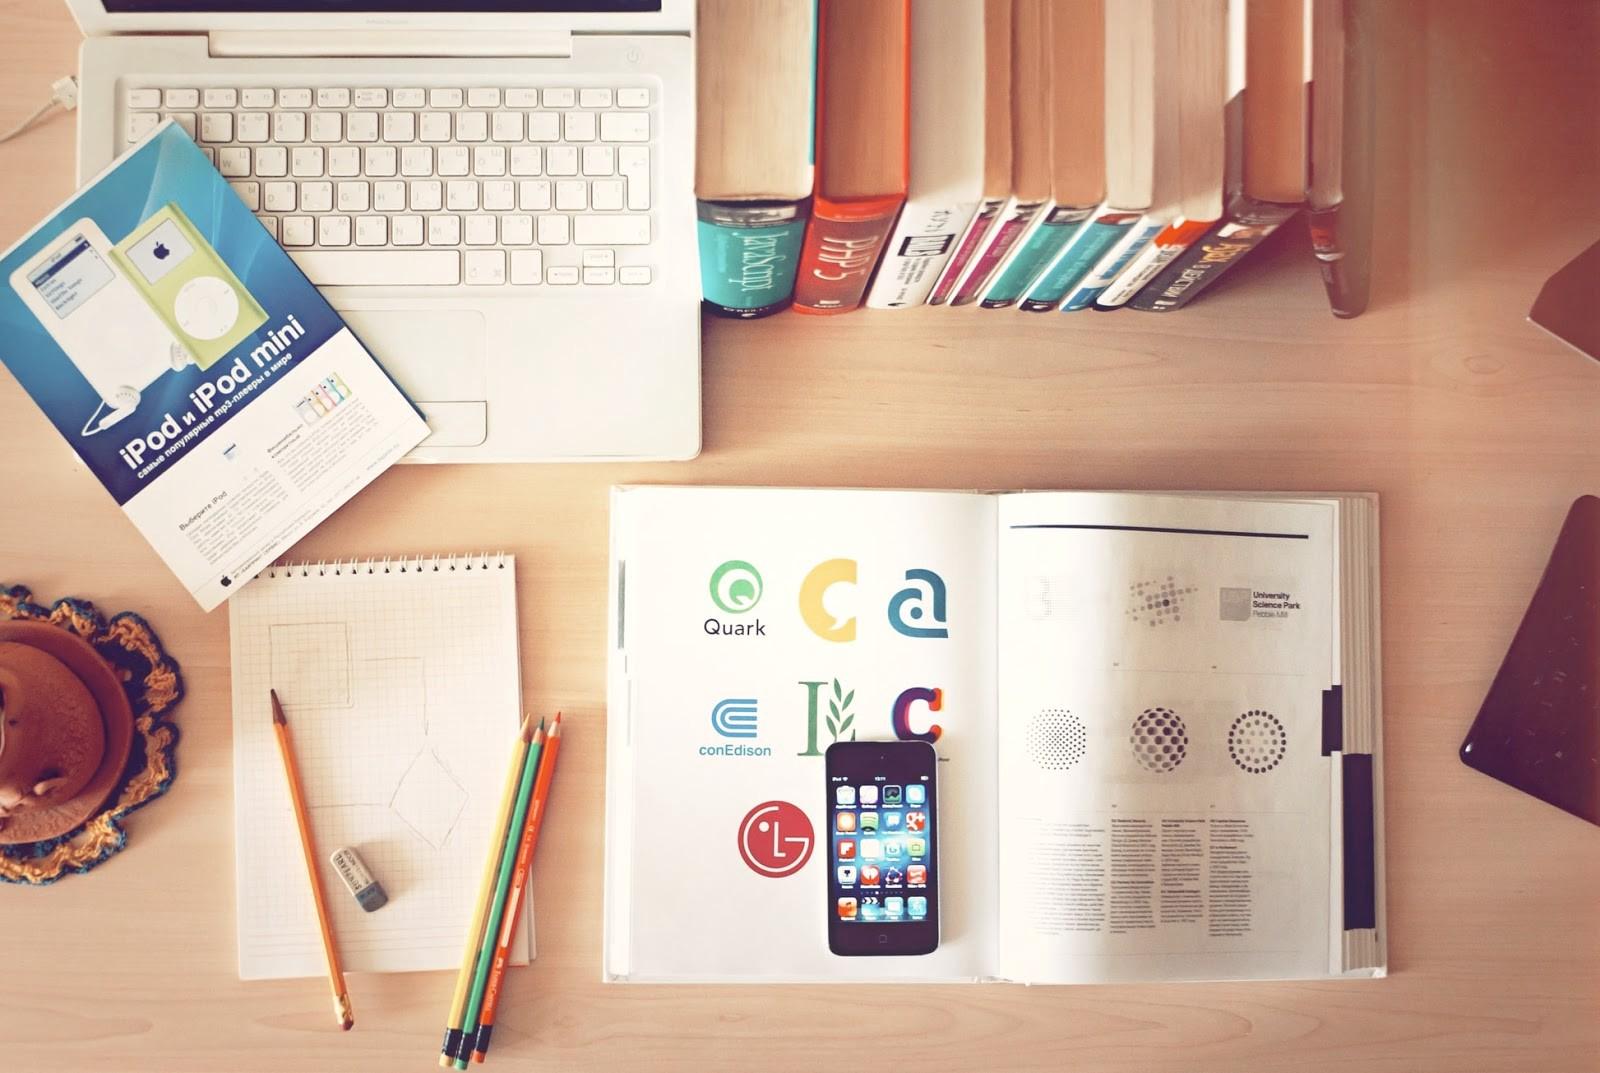 web design trends 2020 (2)